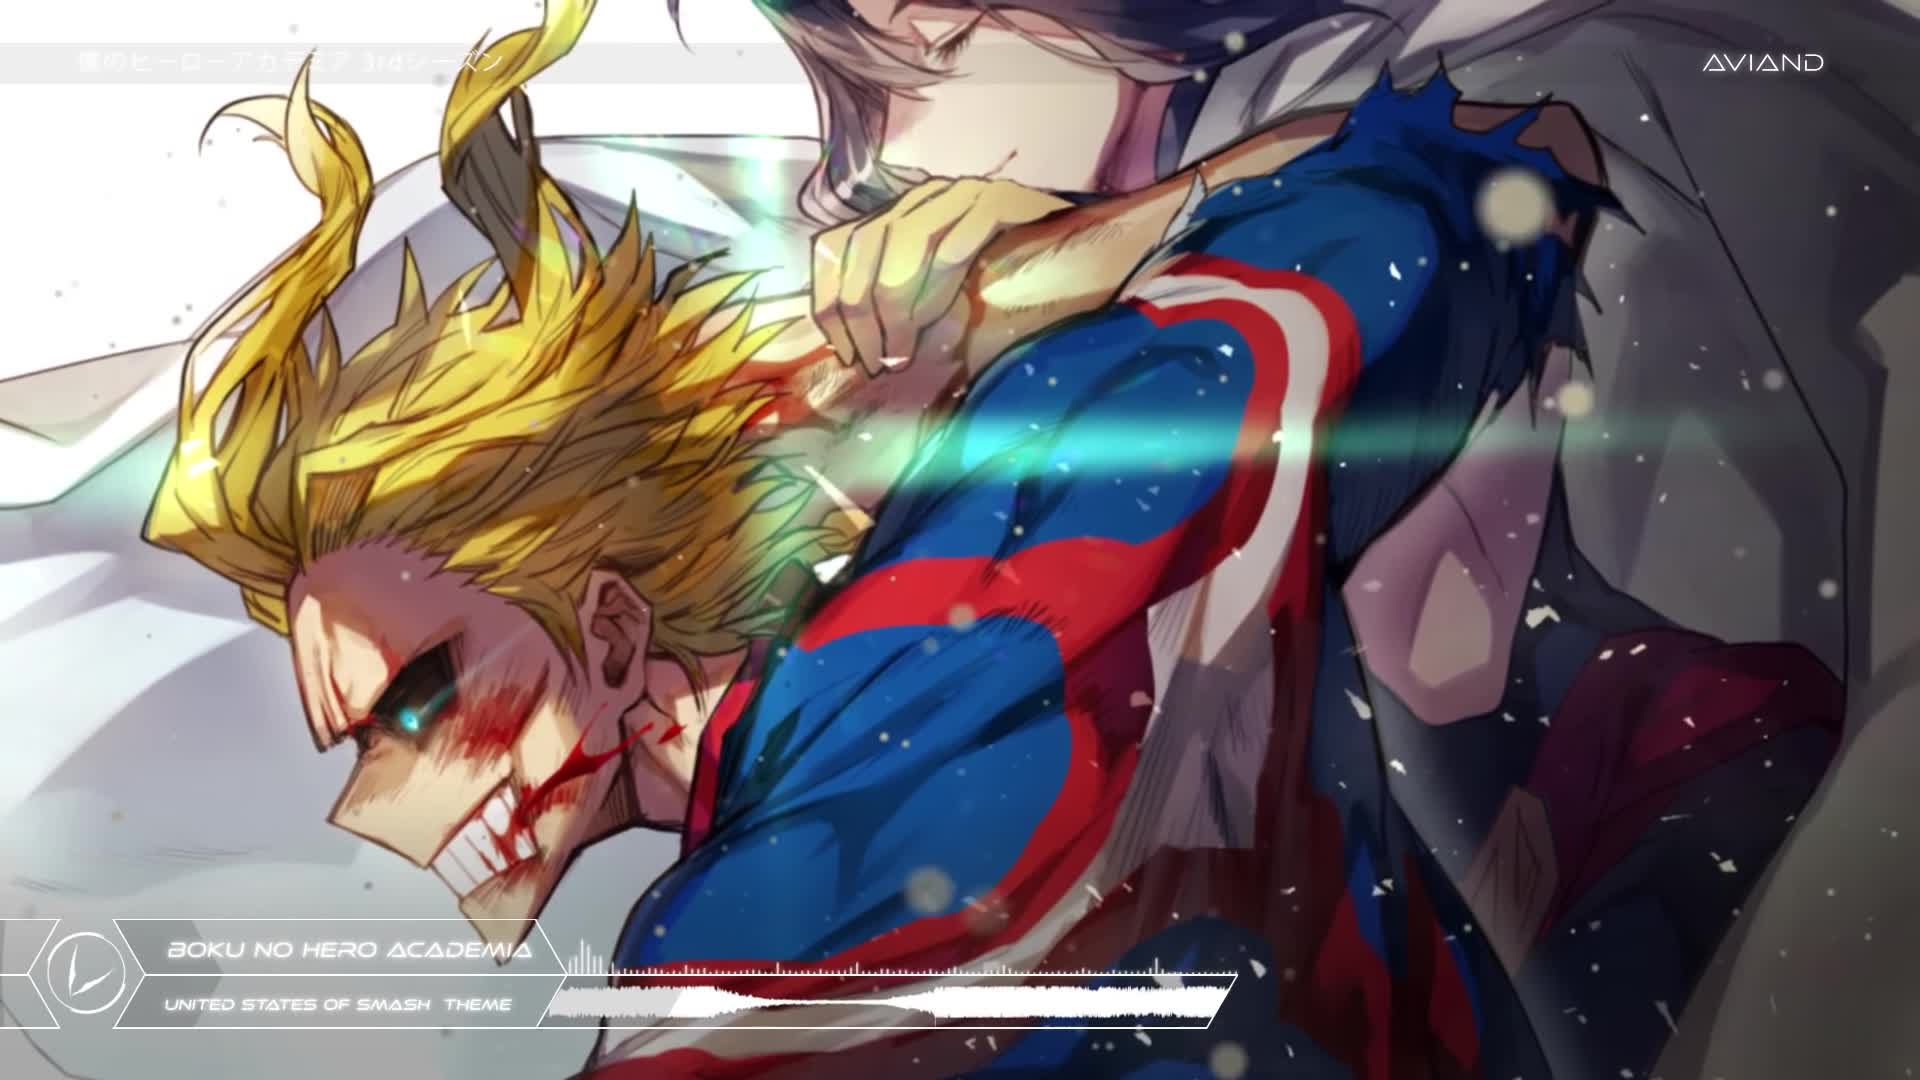 United States Of Smash Boku No Hero Academia Orchestration Epic And Sad Gif